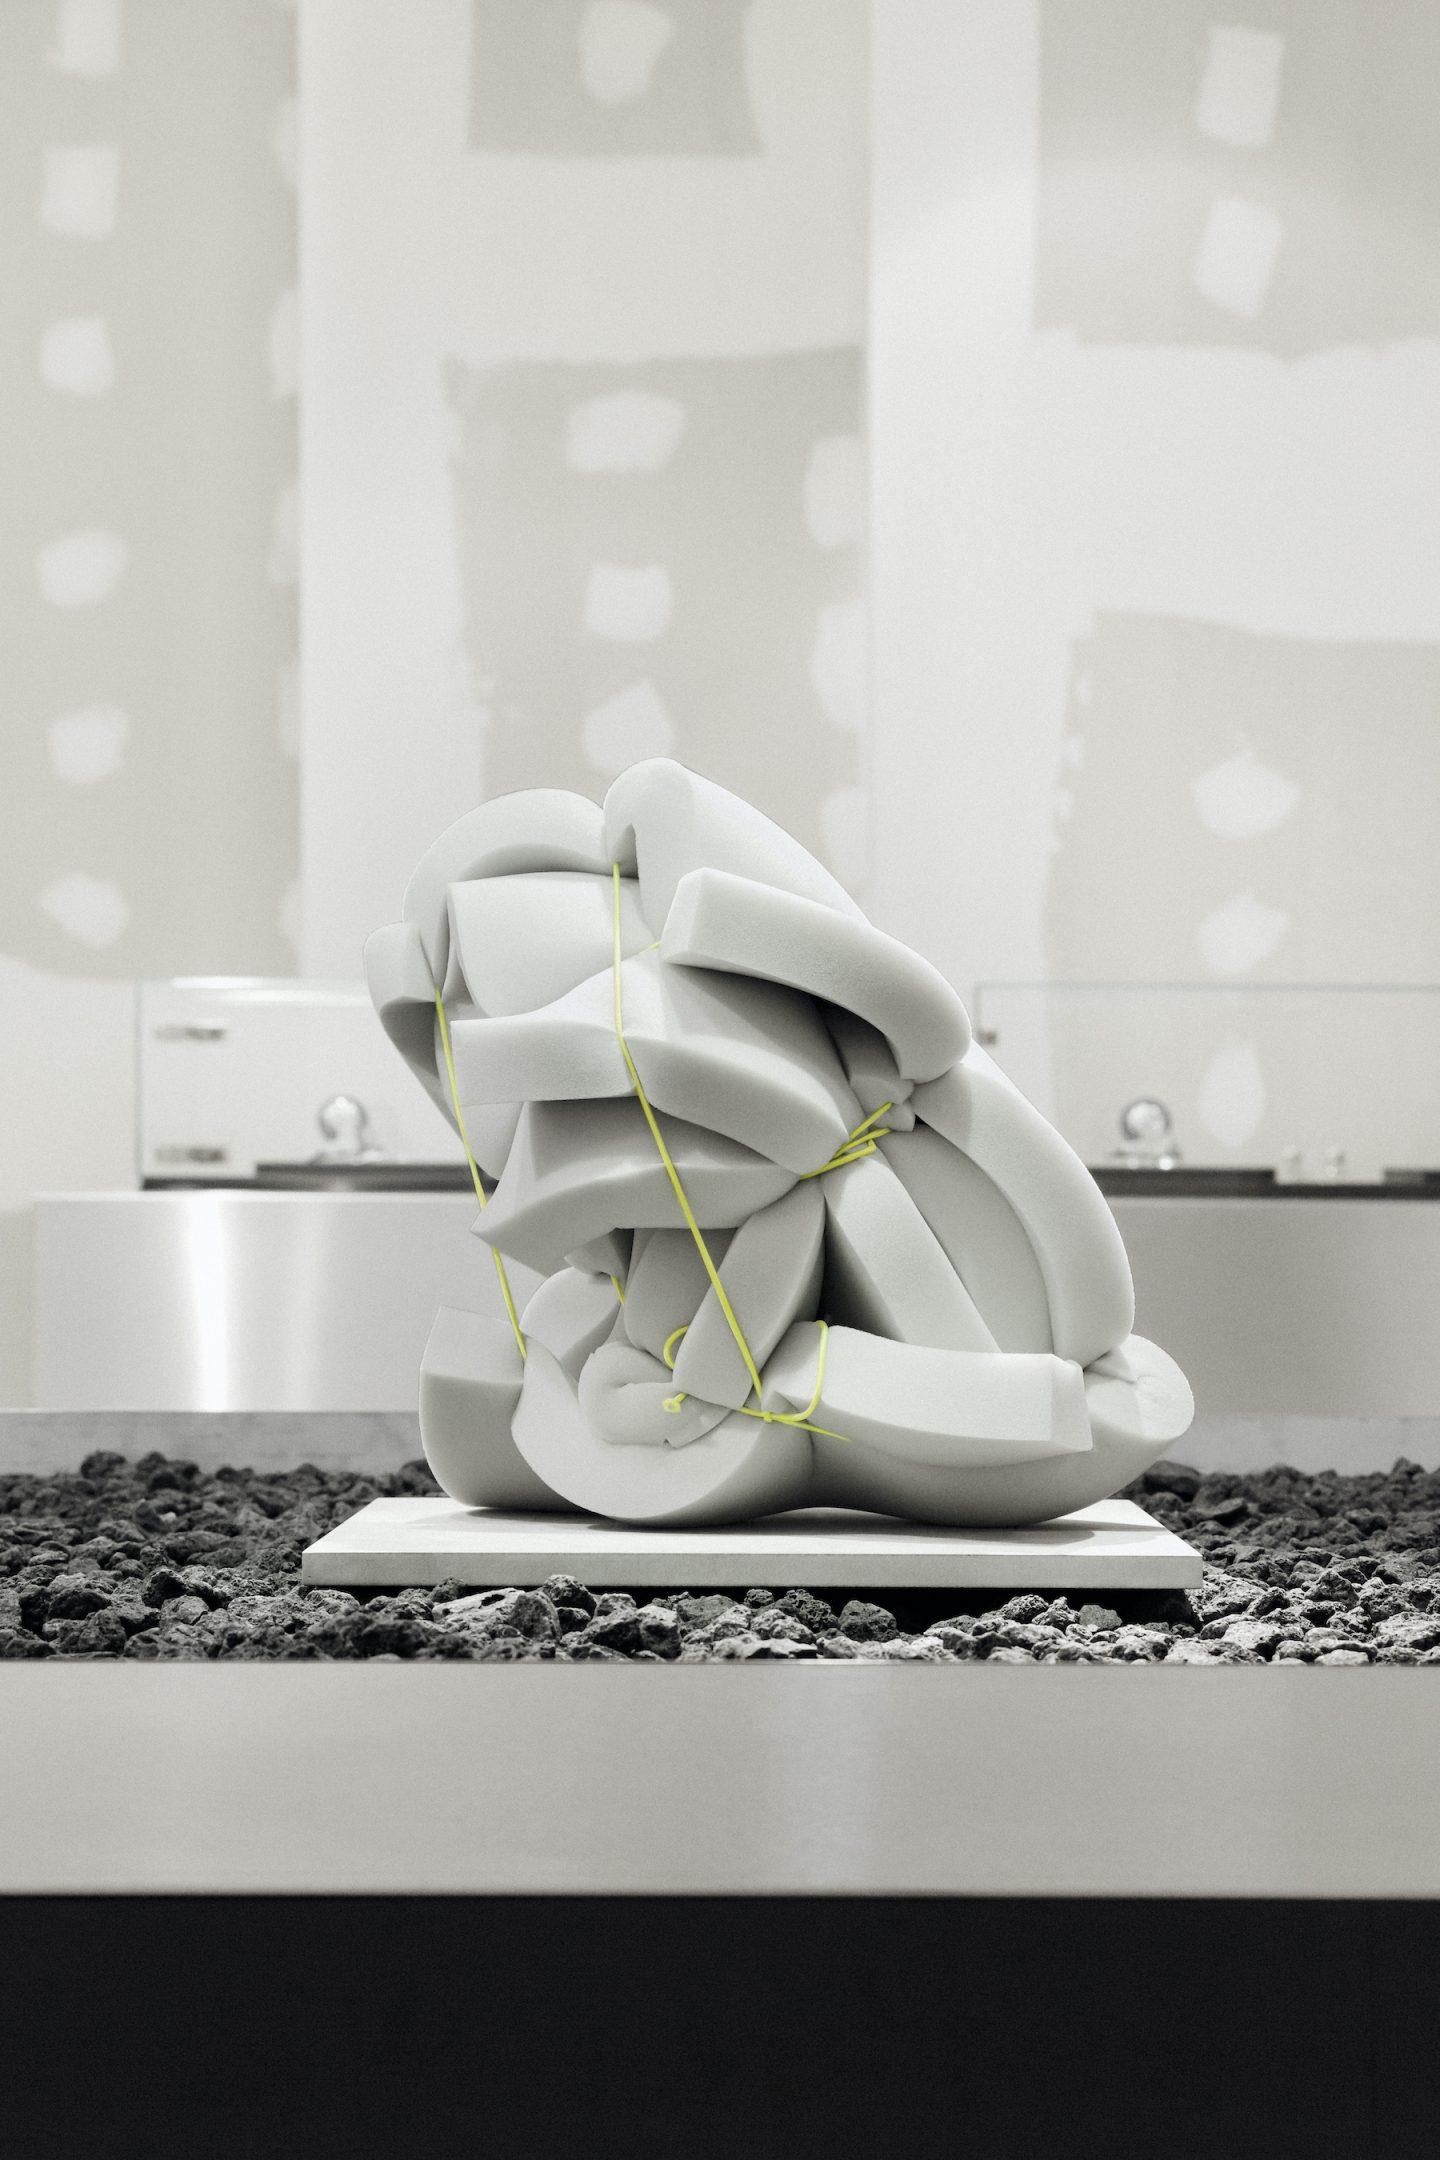 IGNANT-Design-Vaust-Georgestrasse14-04